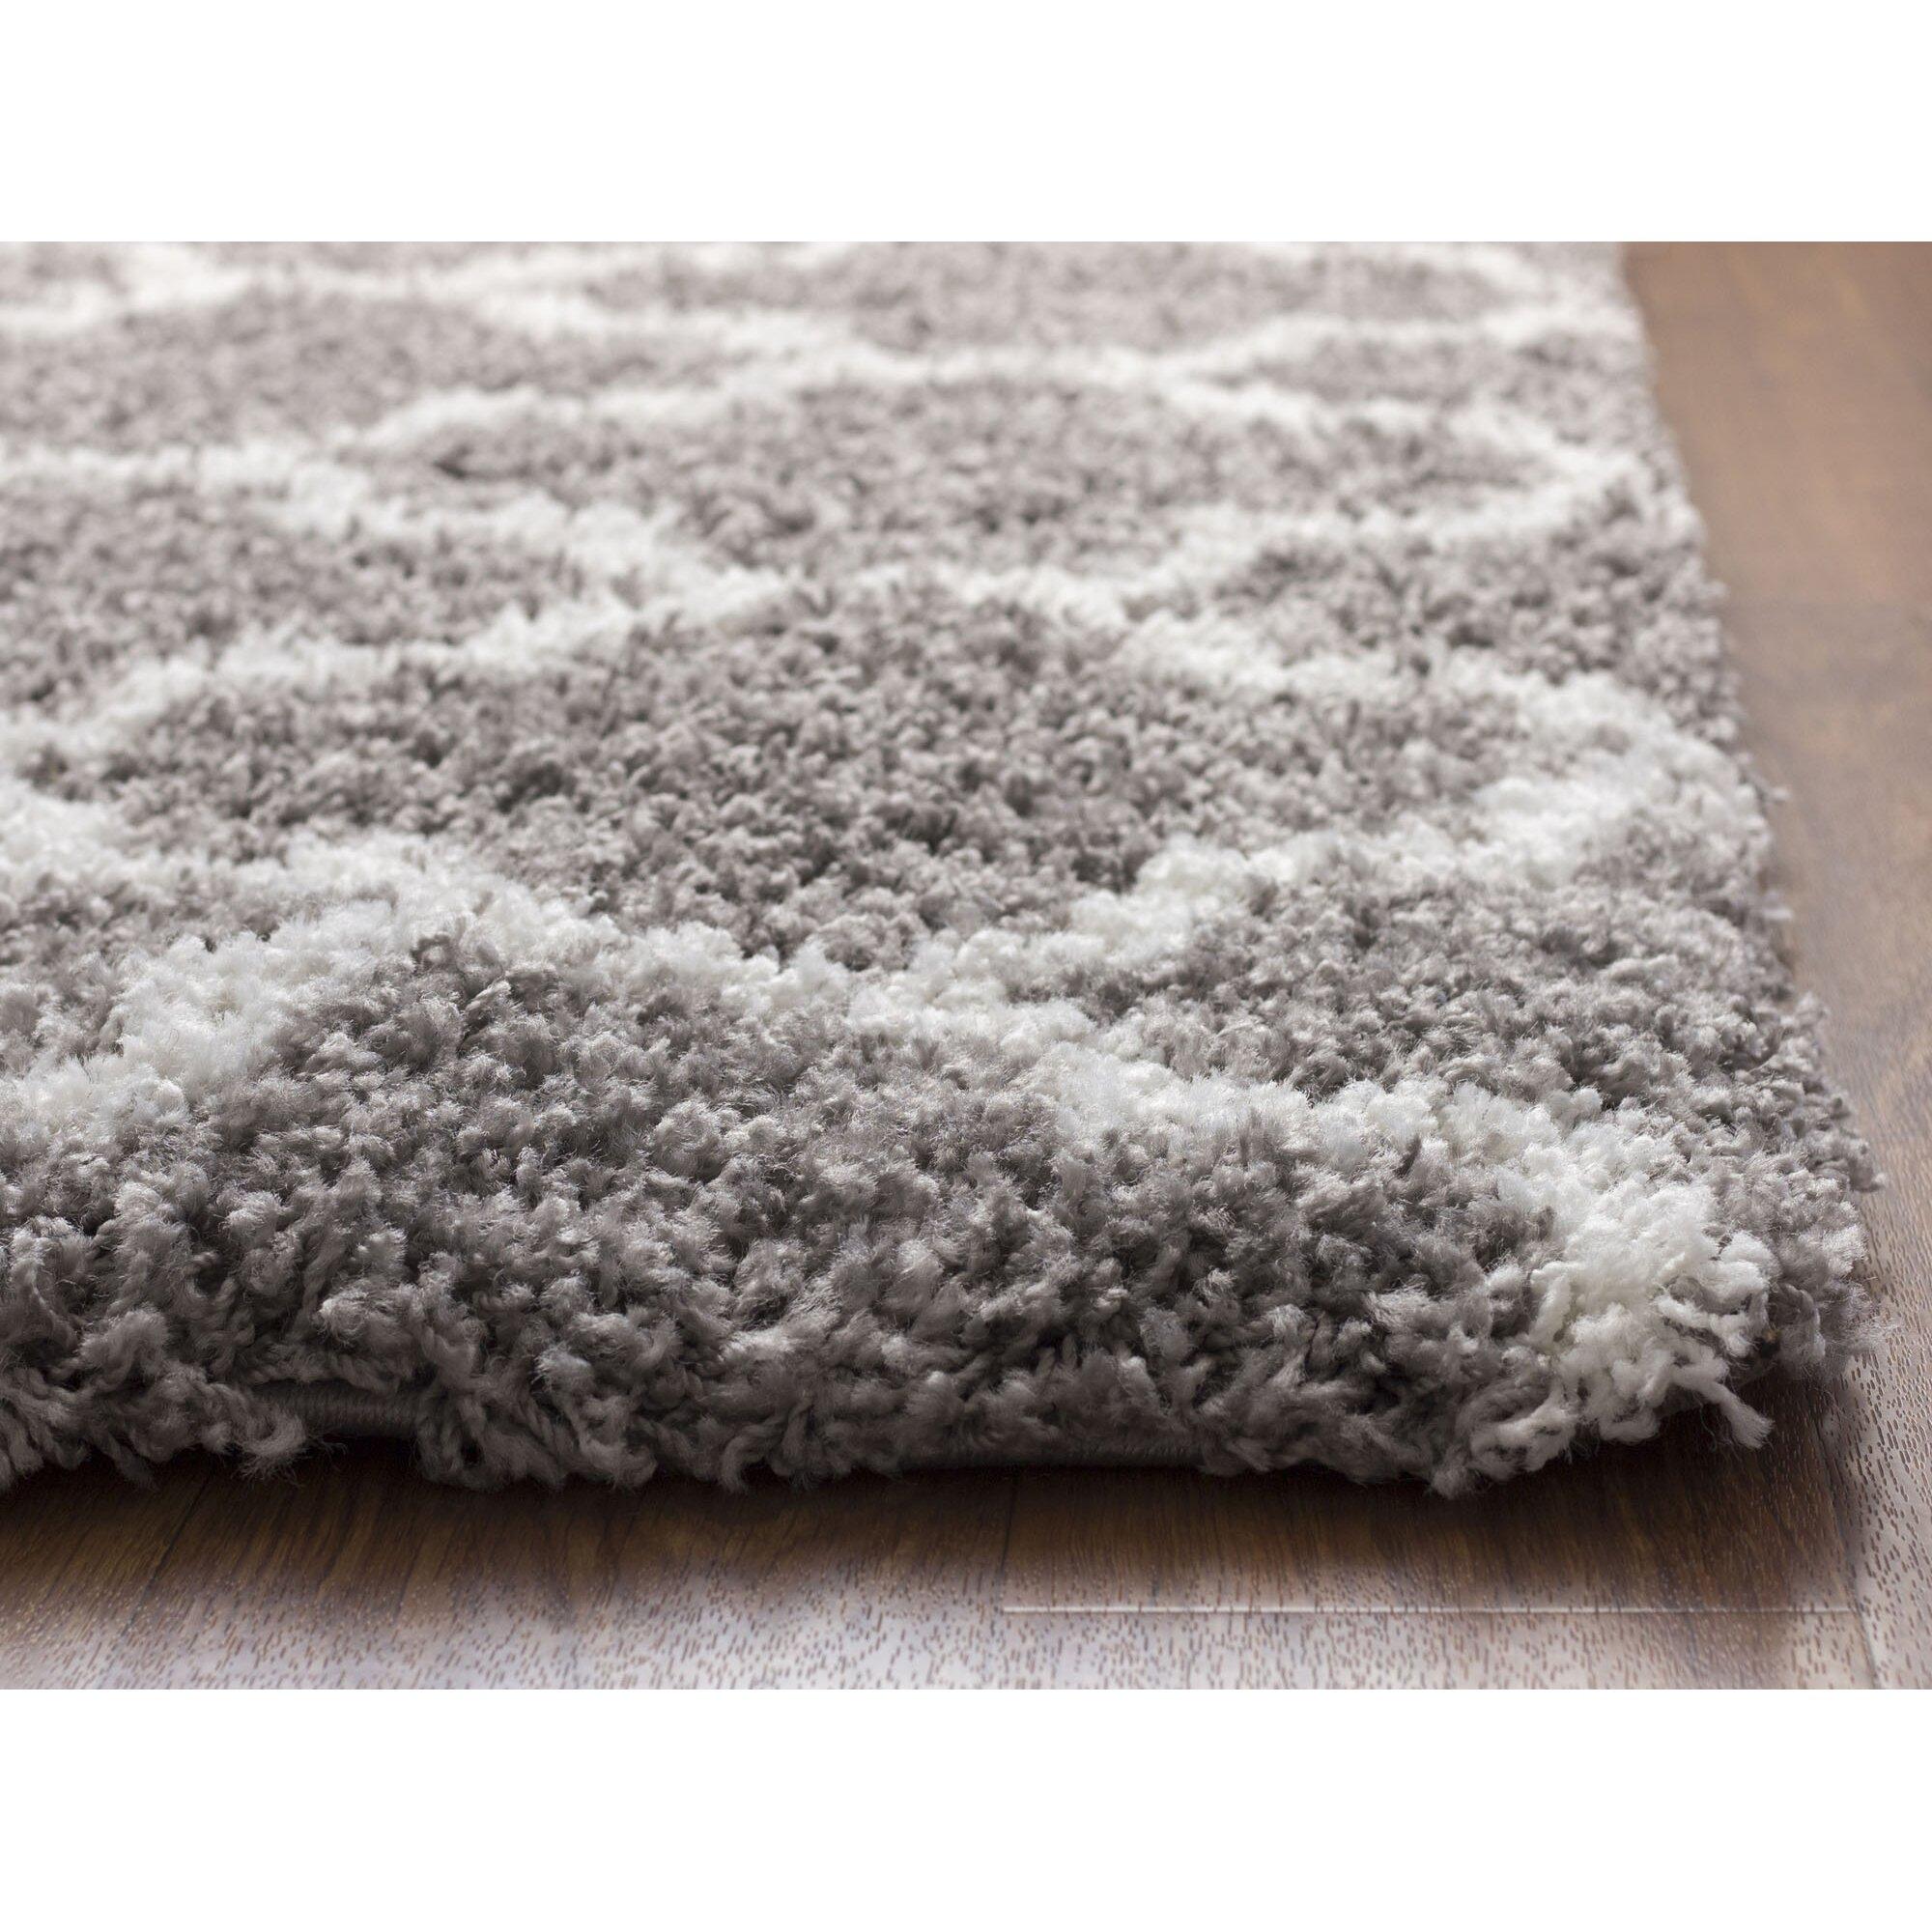 Super Area Rugs Gray/White Area Rug